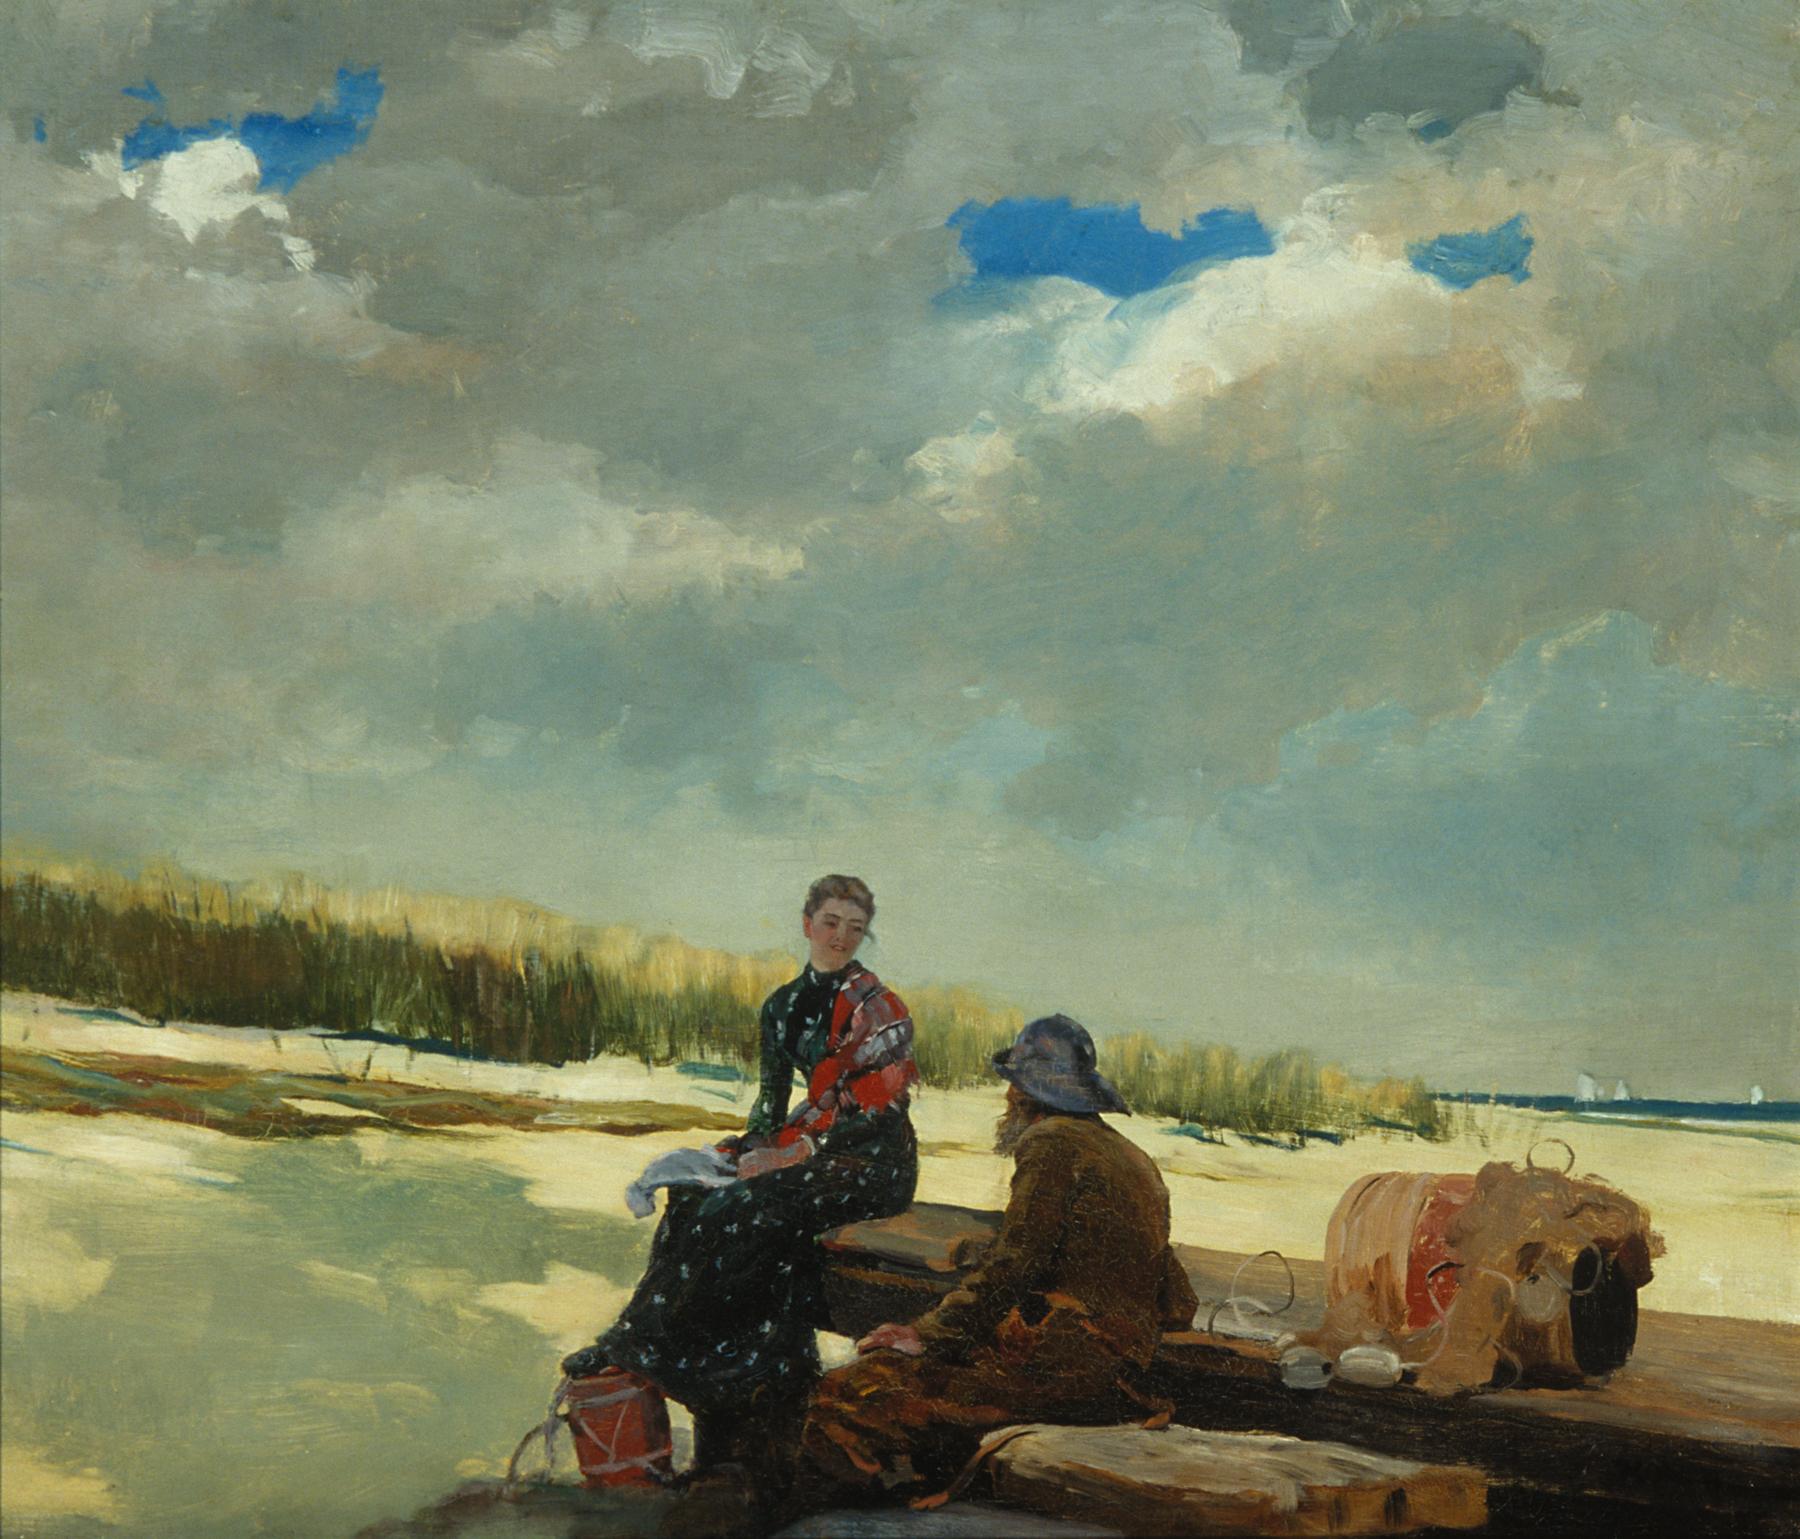 File:Winslow Homer - Cloud Shadows.jpg